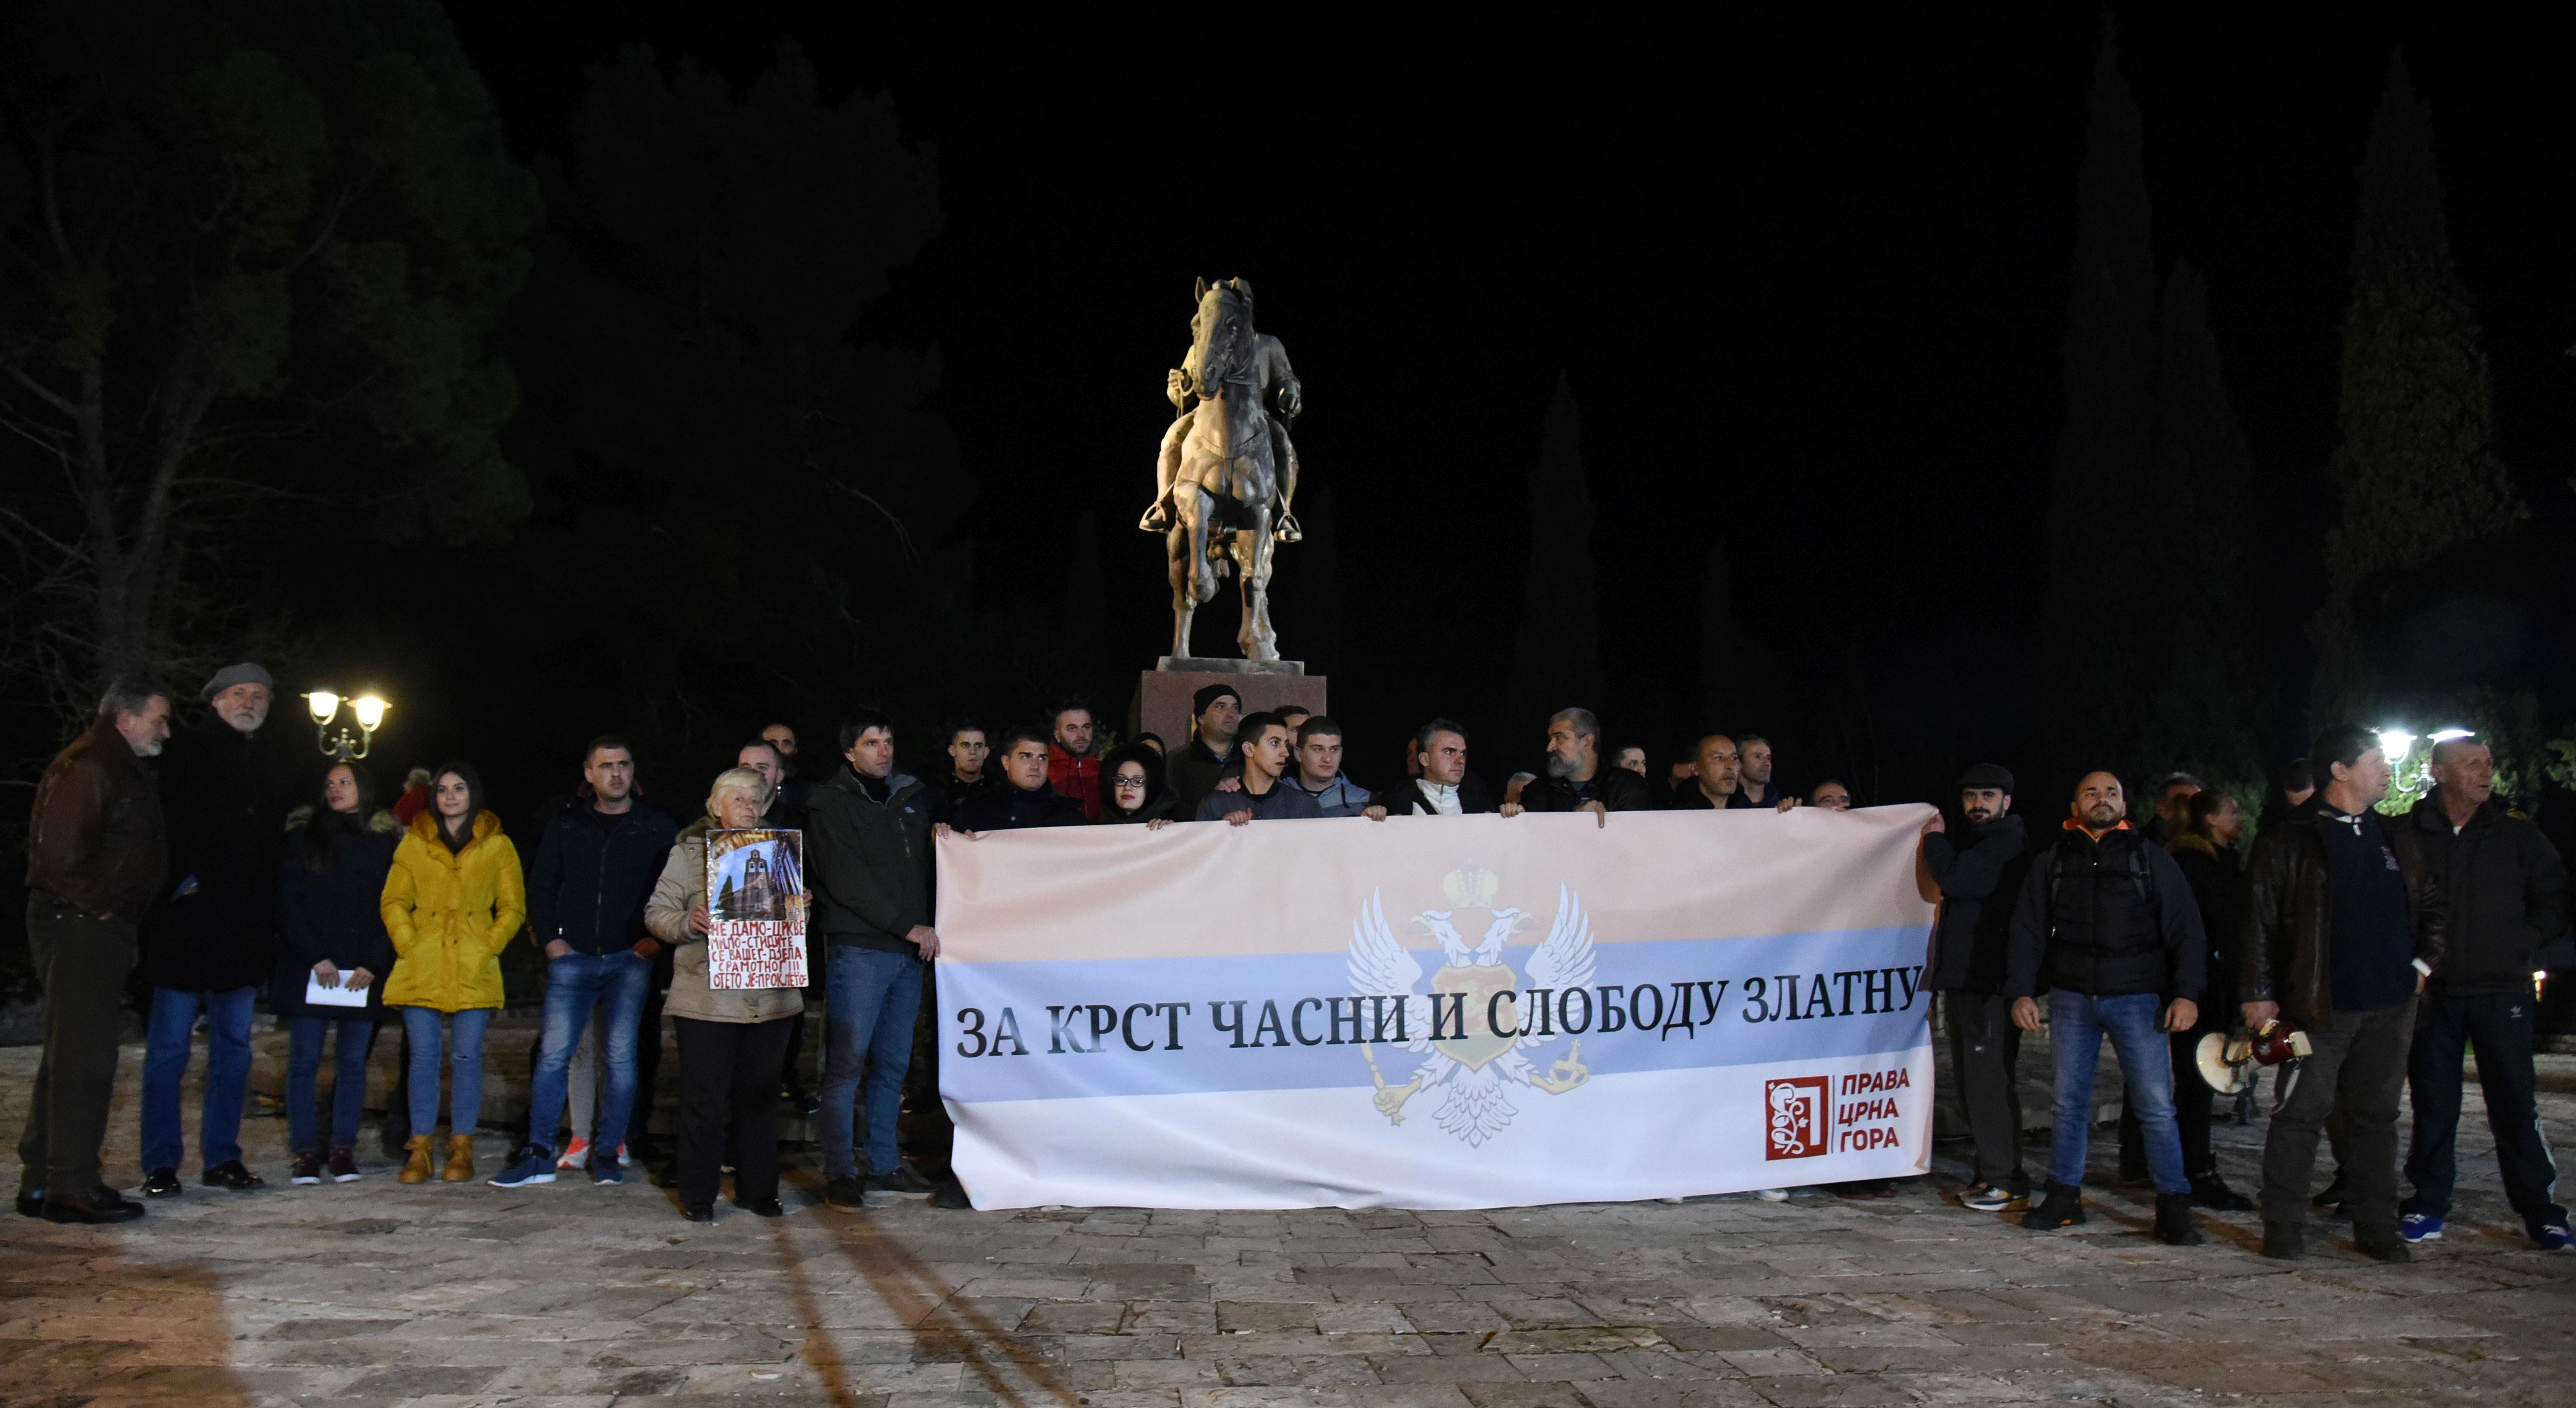 protest Prava Crna Gora